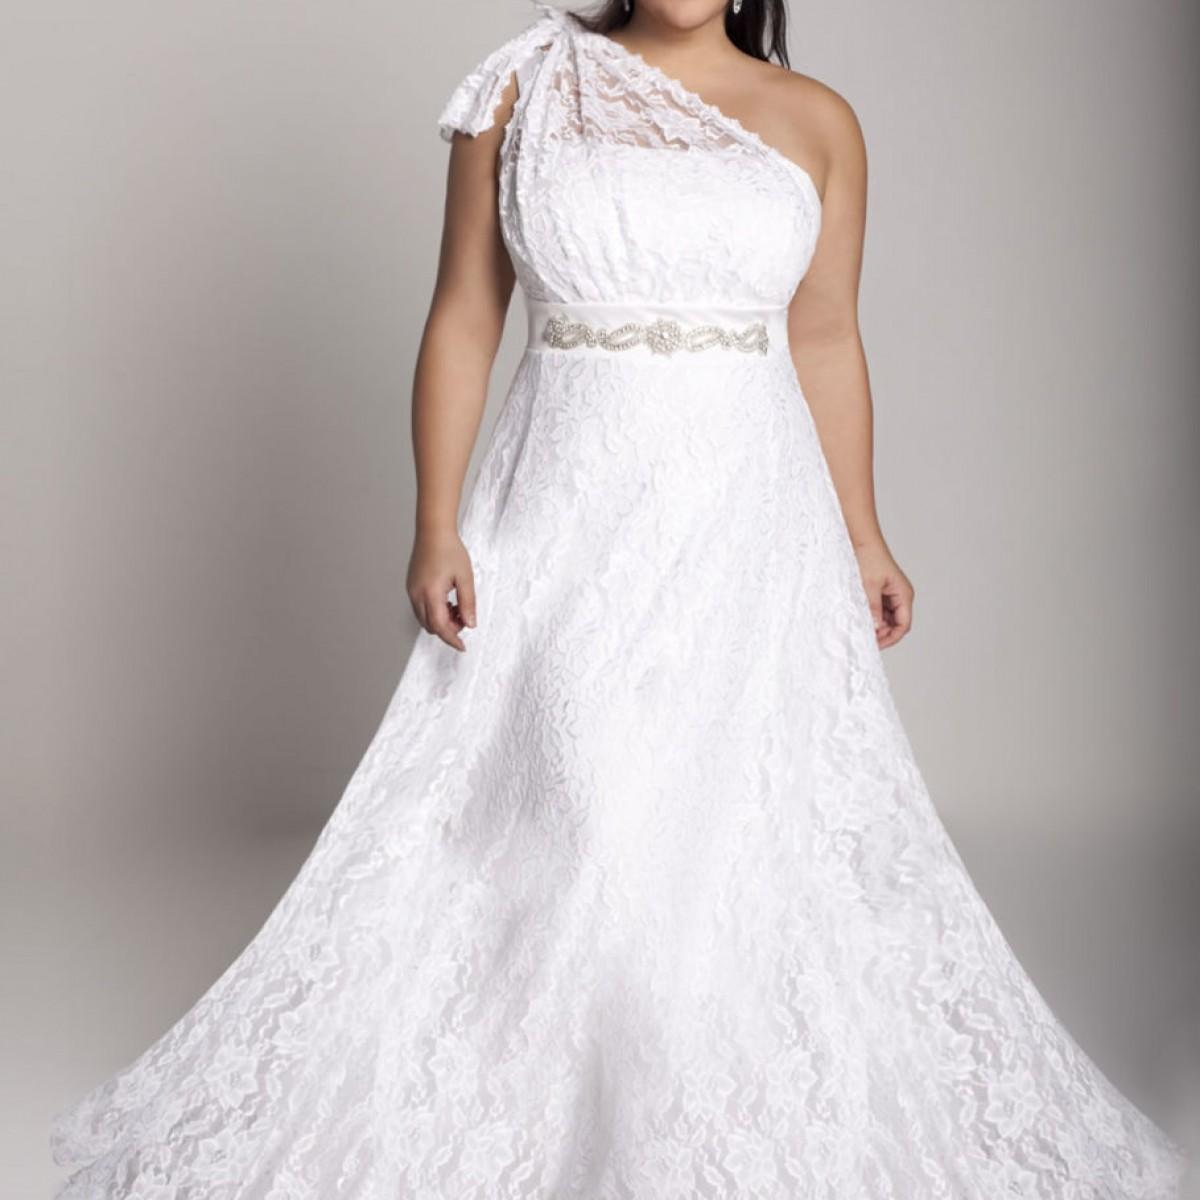 macys beach wedding dresses photo - 1